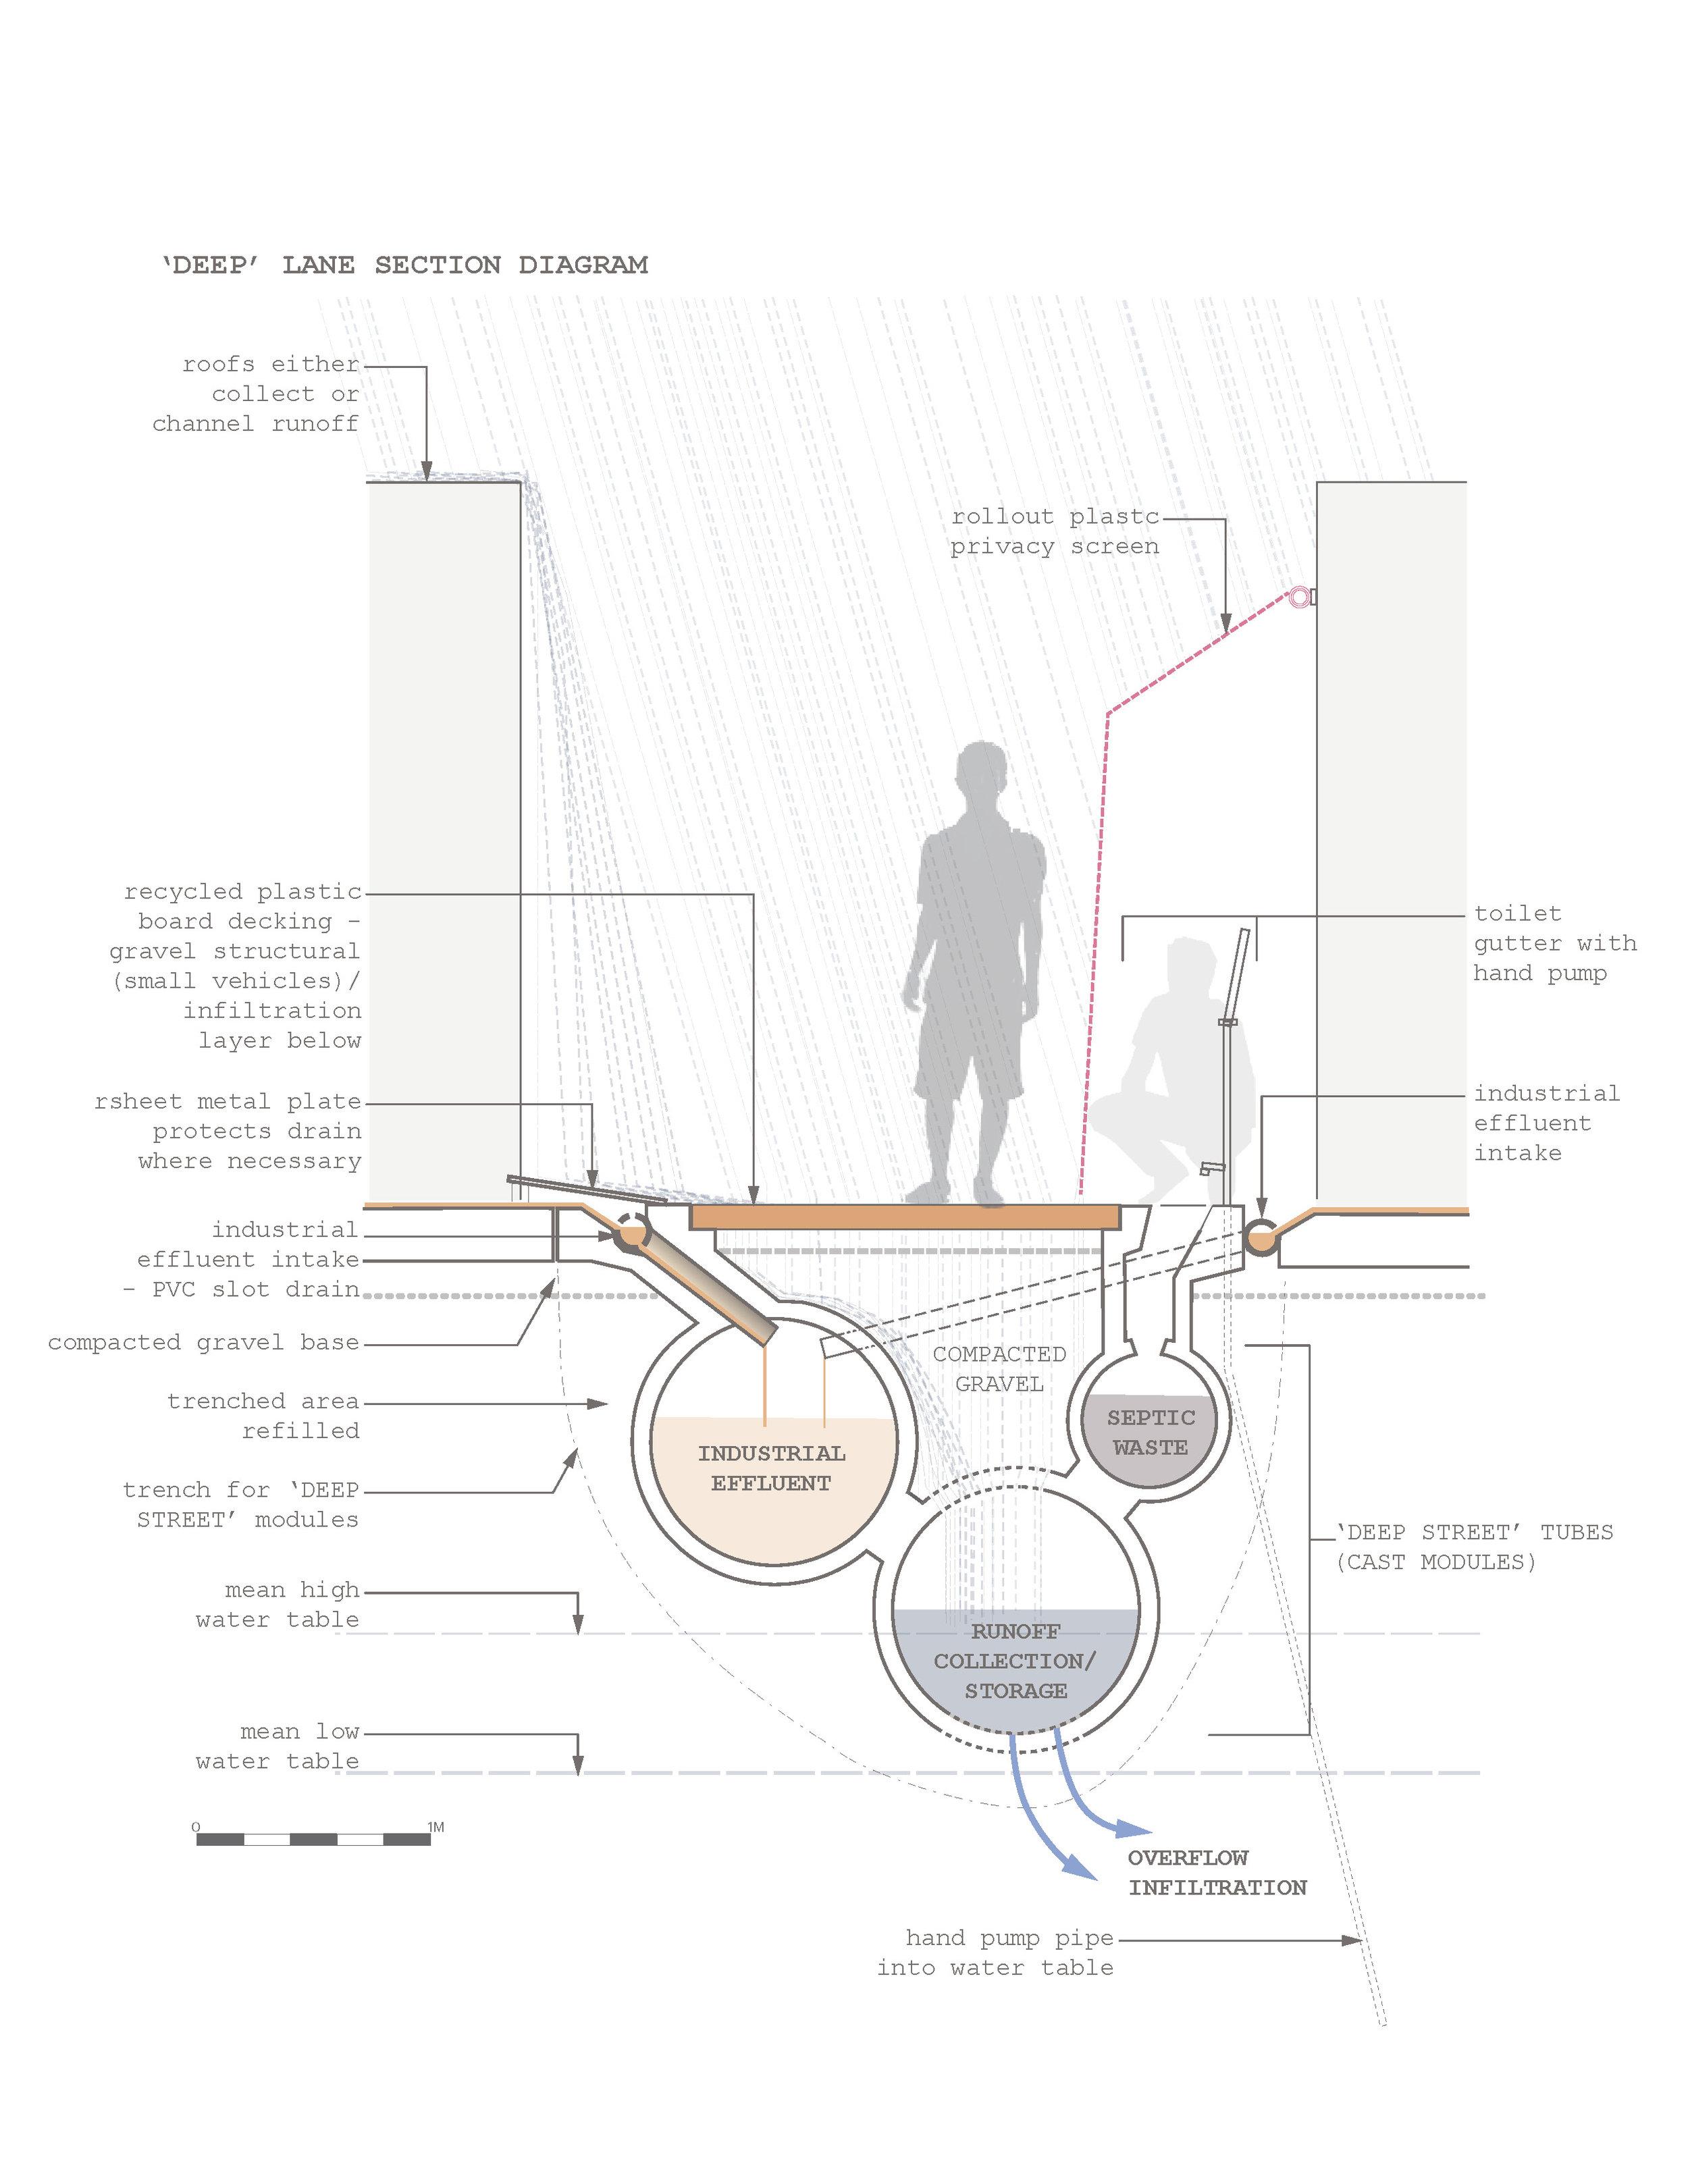 lane diagram_09.07.14.jpg